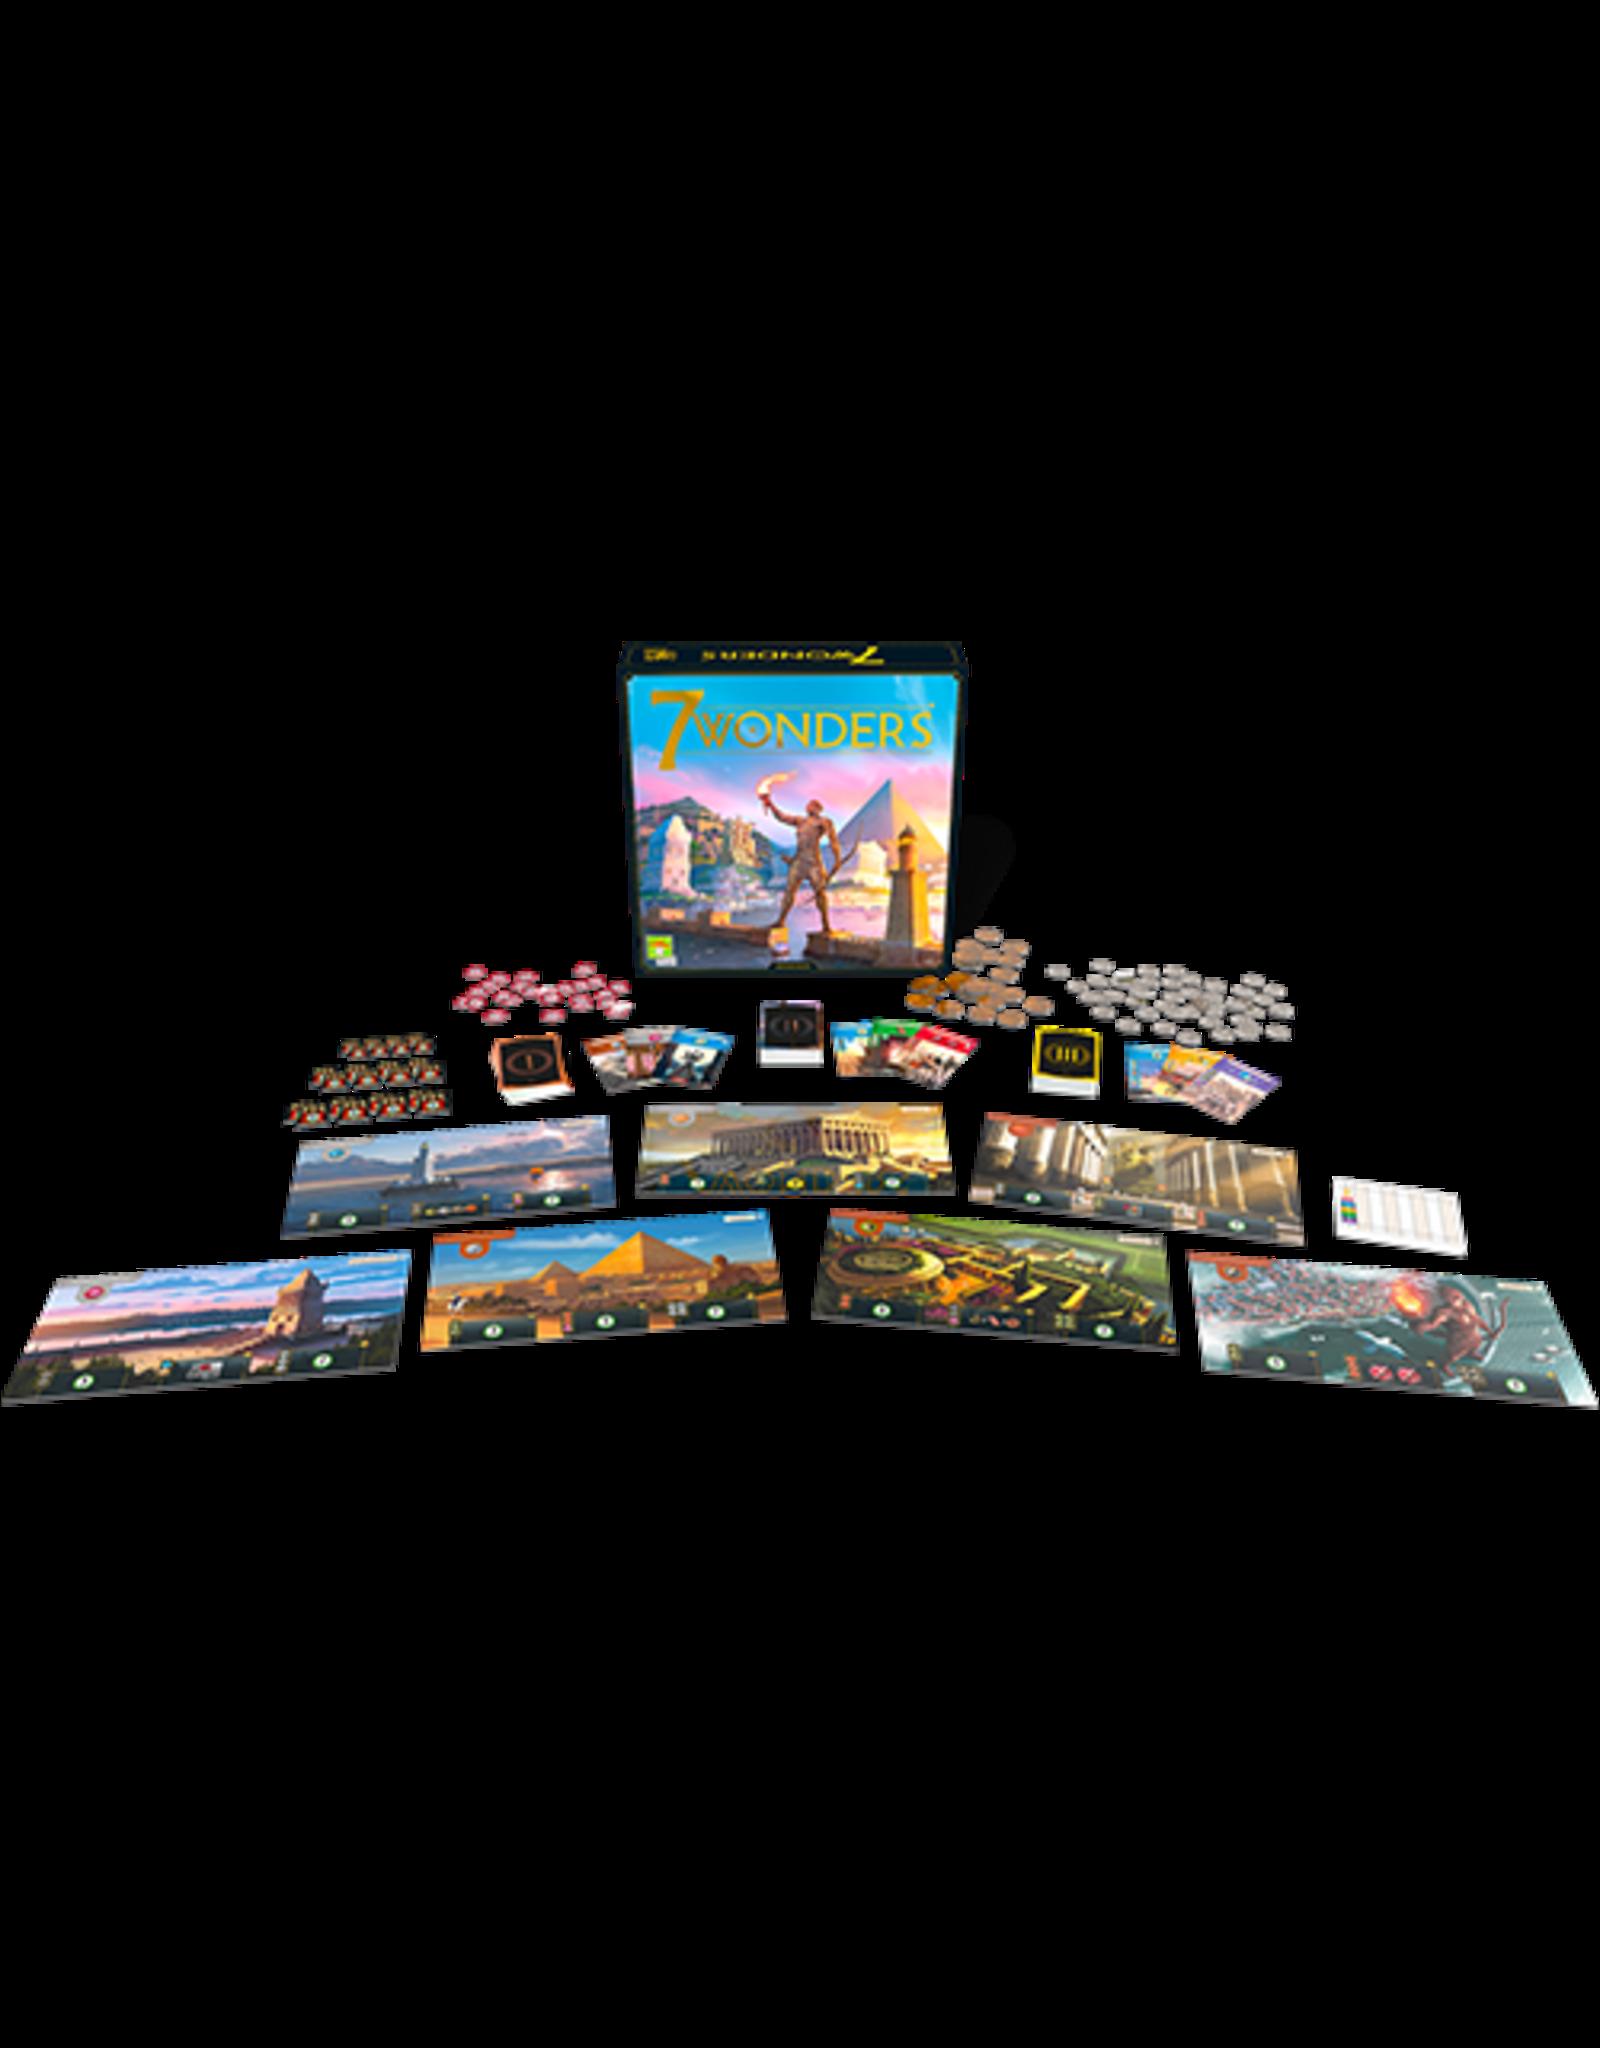 Repos 7 Wonders (2nd Edition)